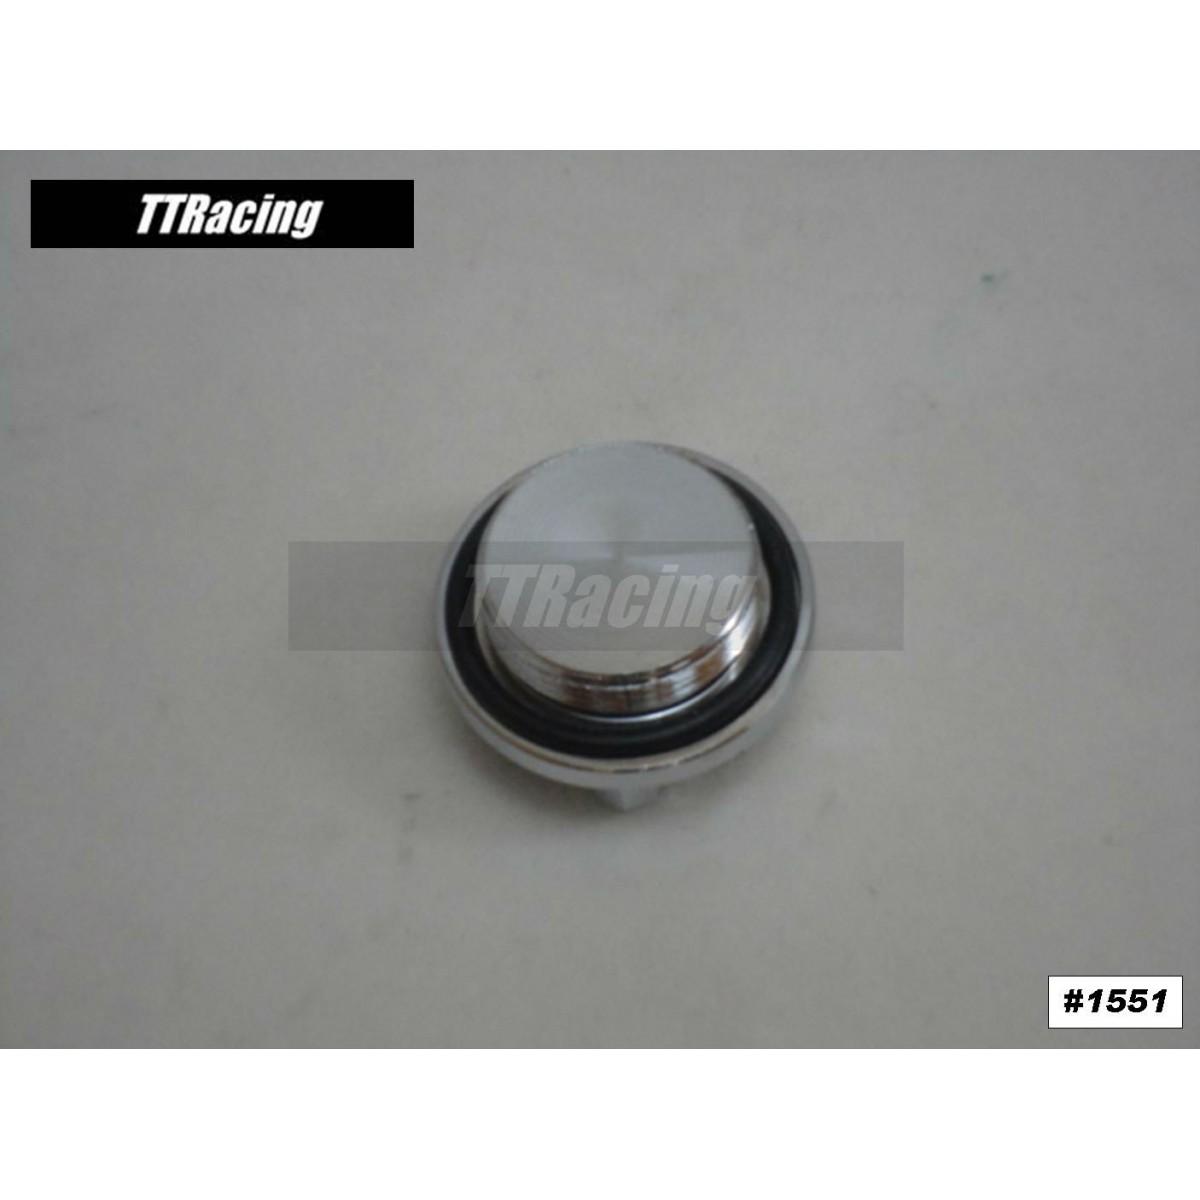 Tampa do óleo Kawasaki NINJA VULCAN cromado  - T & T Soluções